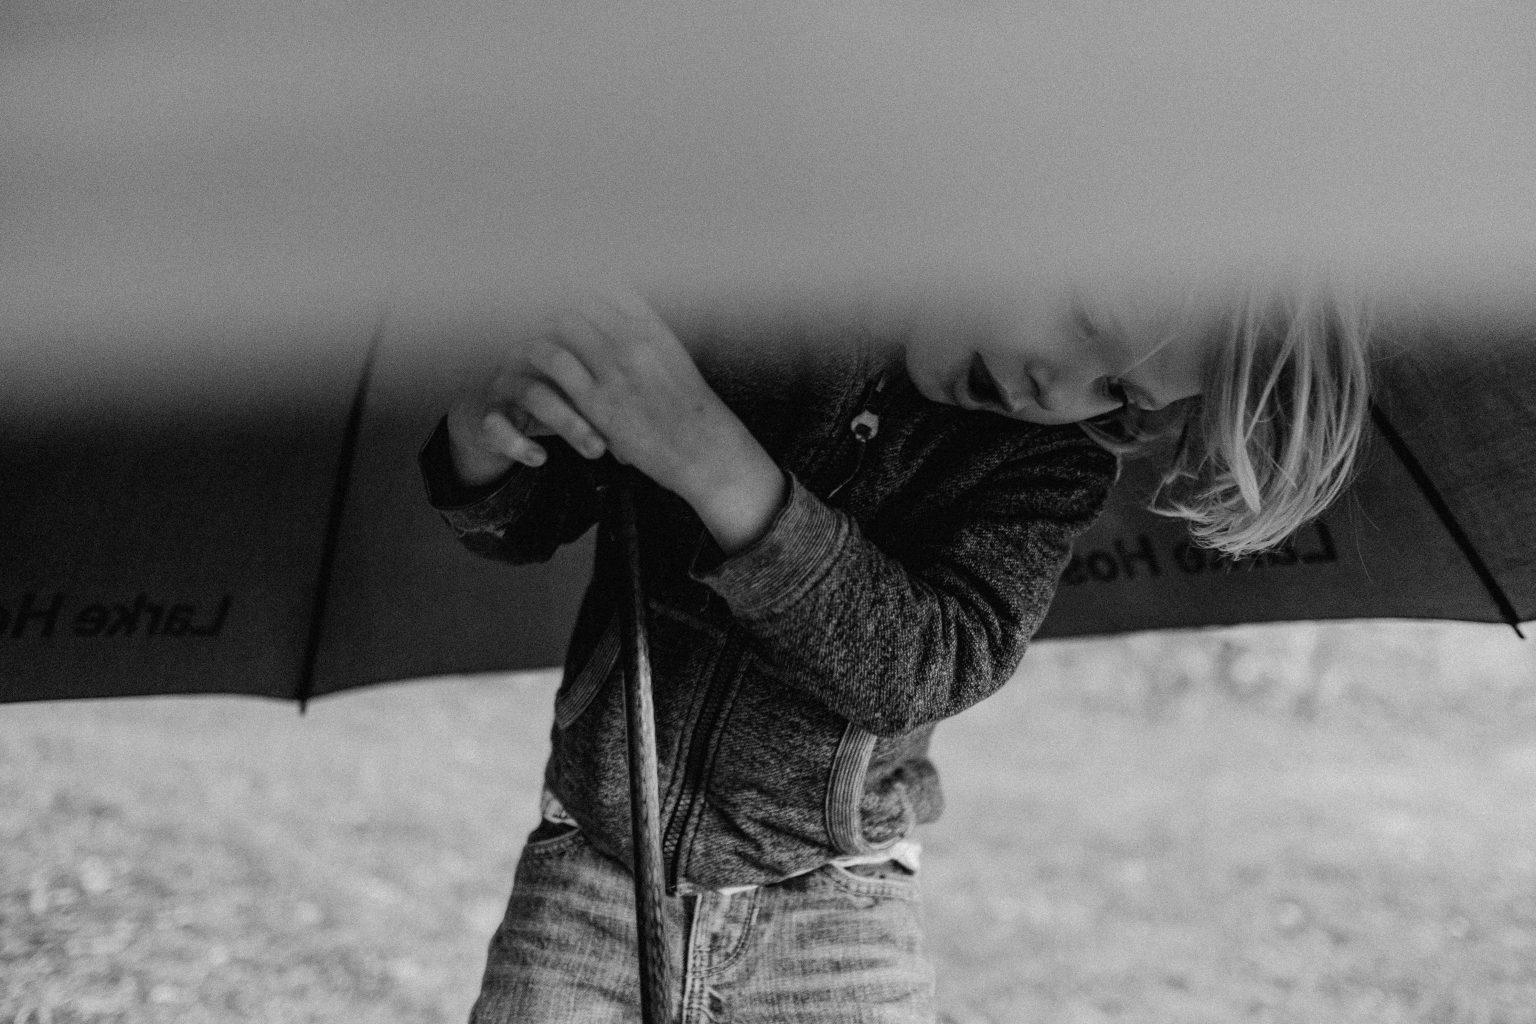 boy with umbrella Sydney harbour